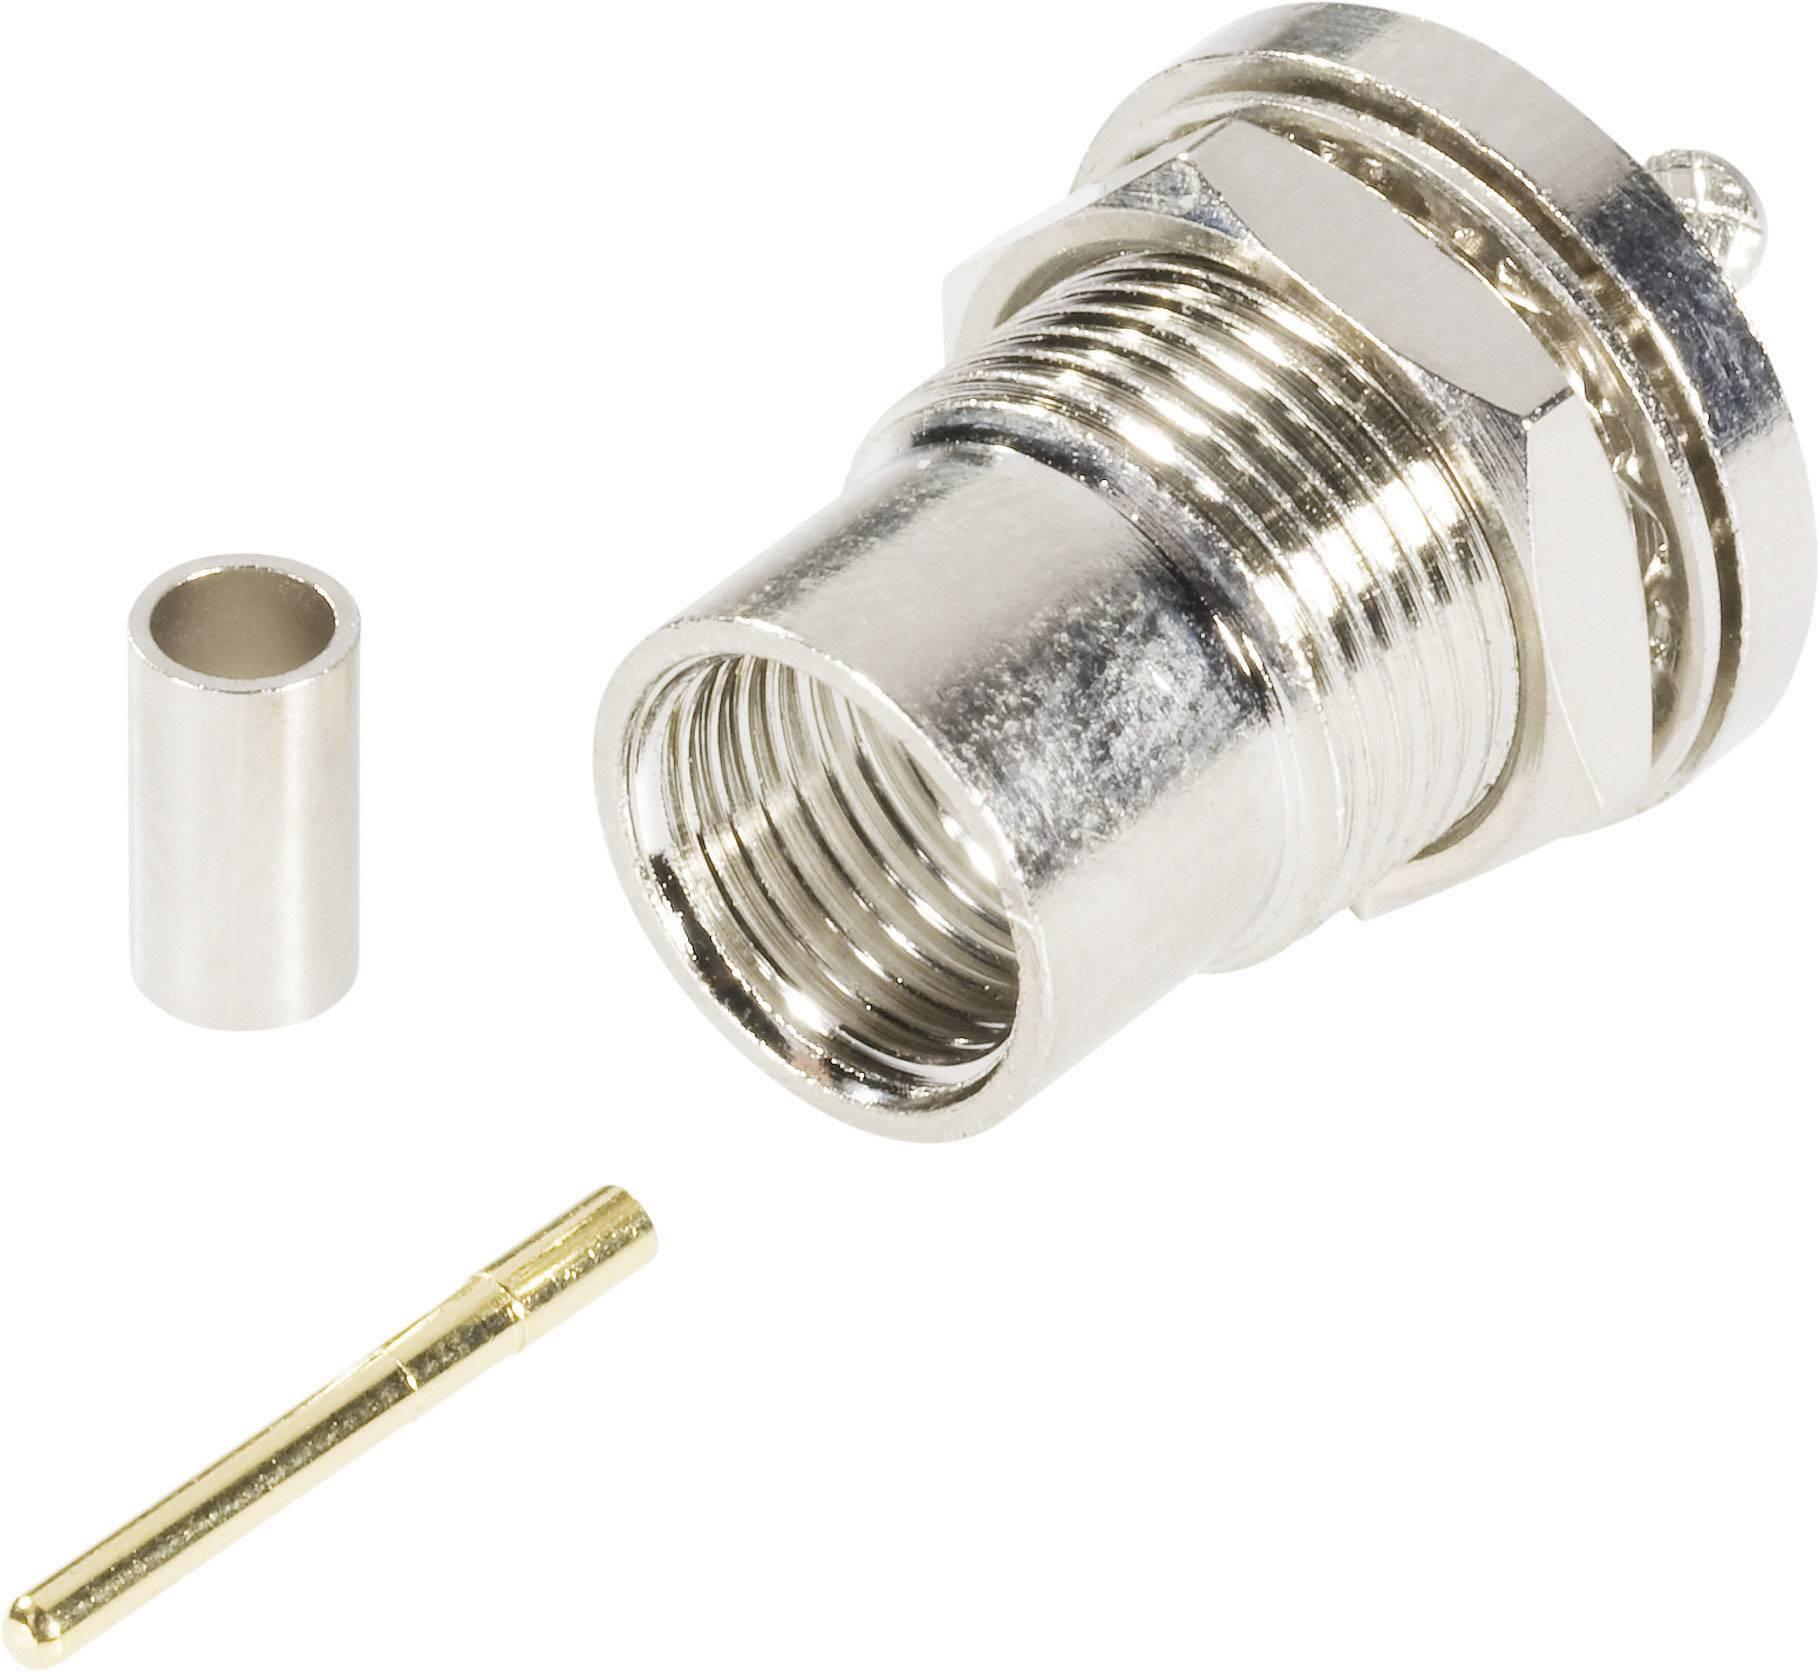 FME konektor - zástrčka, vestavná rovná TRU COMPONENTS 2.90 mm, 1 ks